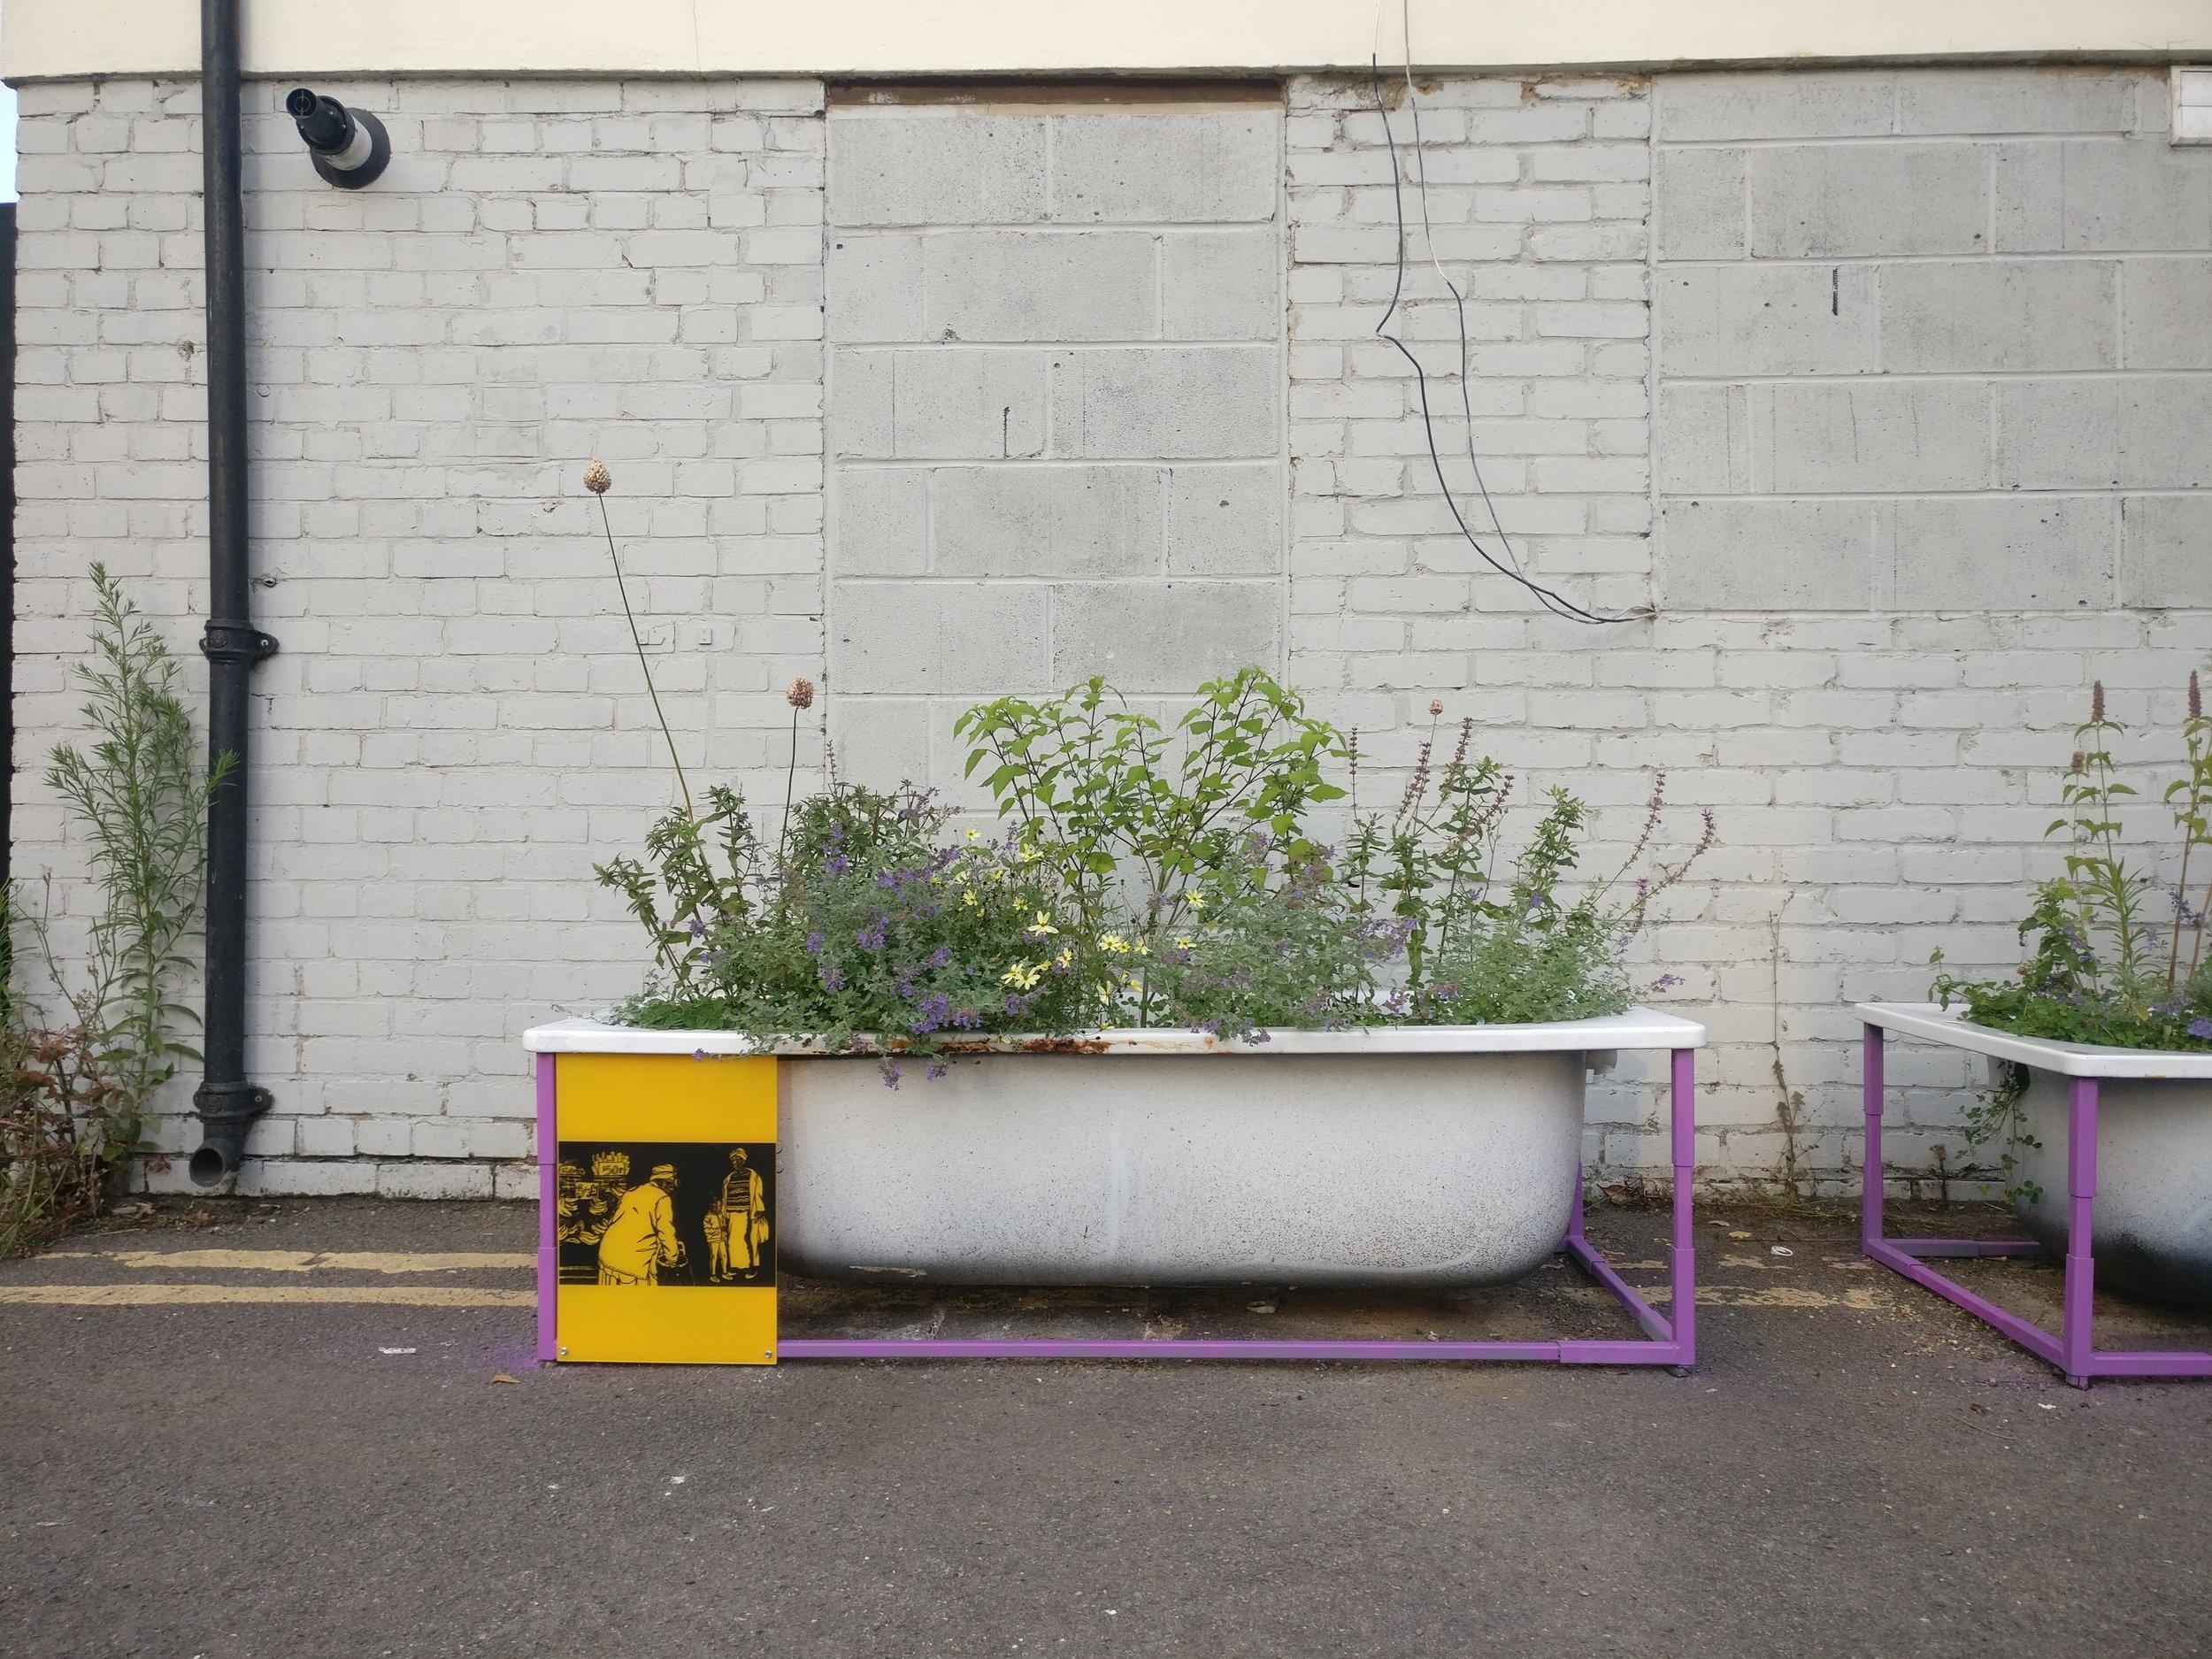 PEER tub artwork 1/2